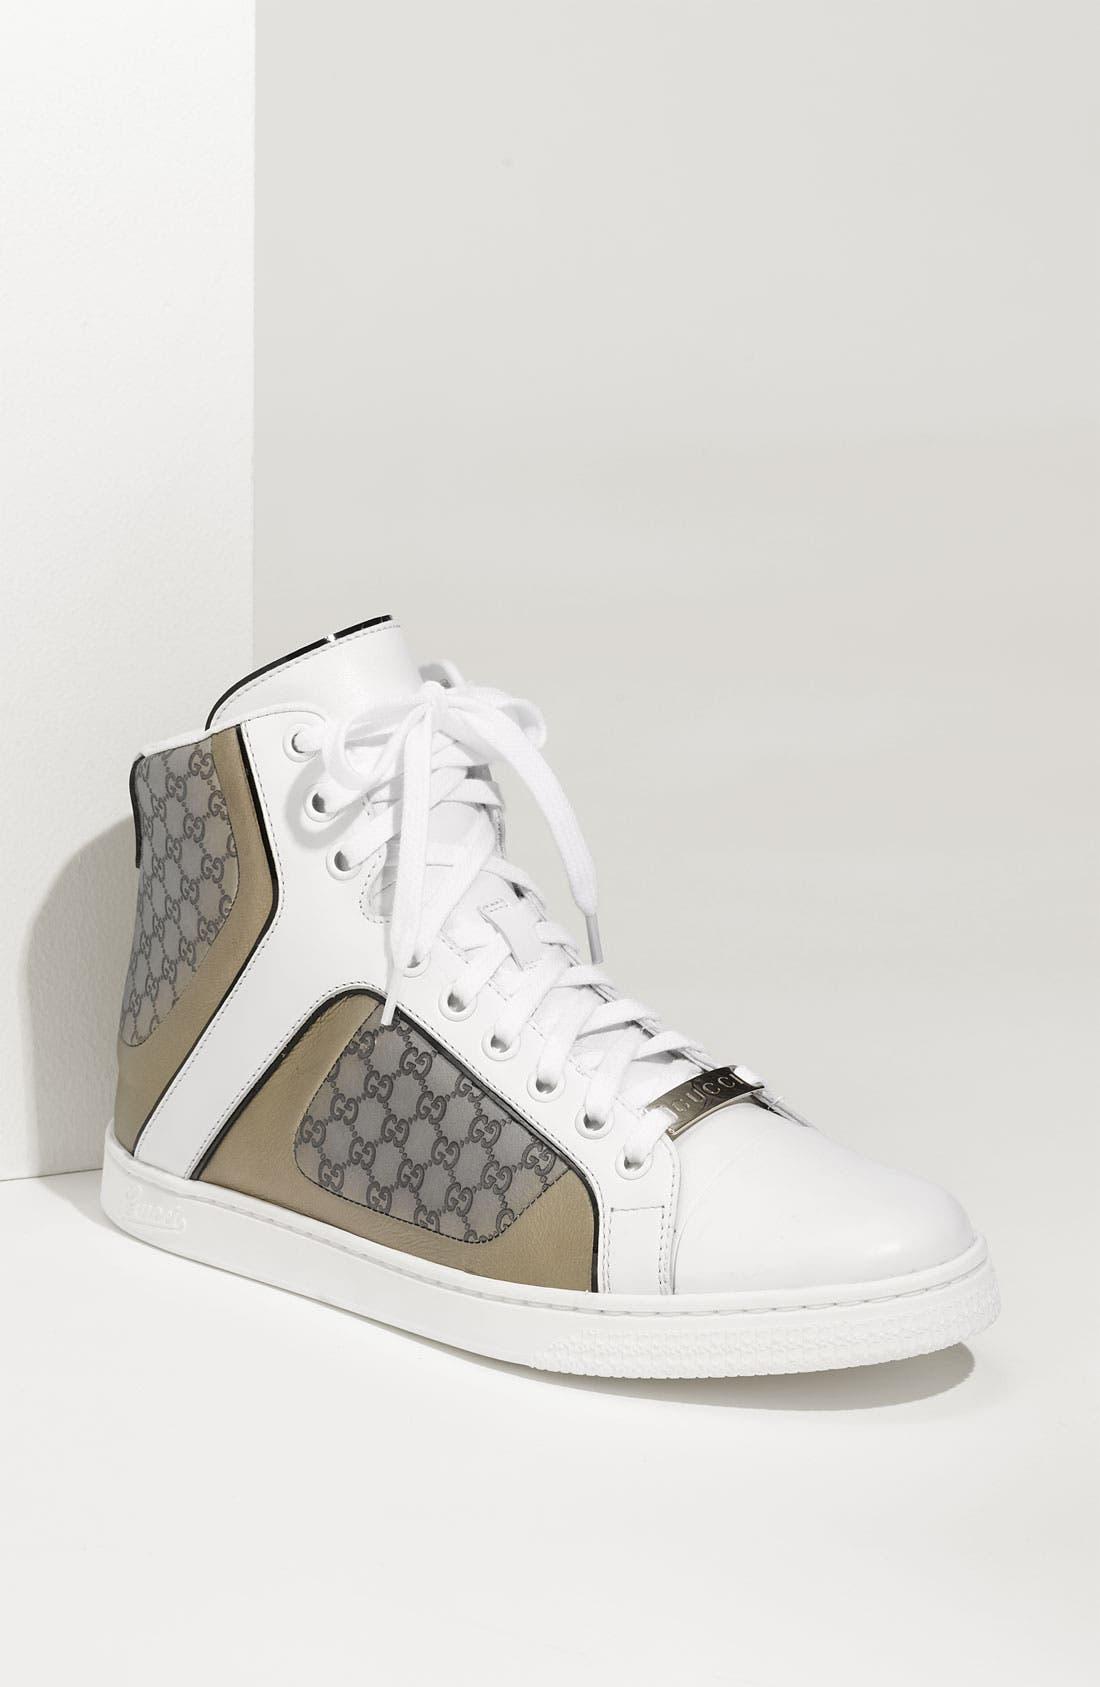 Main Image - Gucci 'Coda Pop' High Top Sneaker